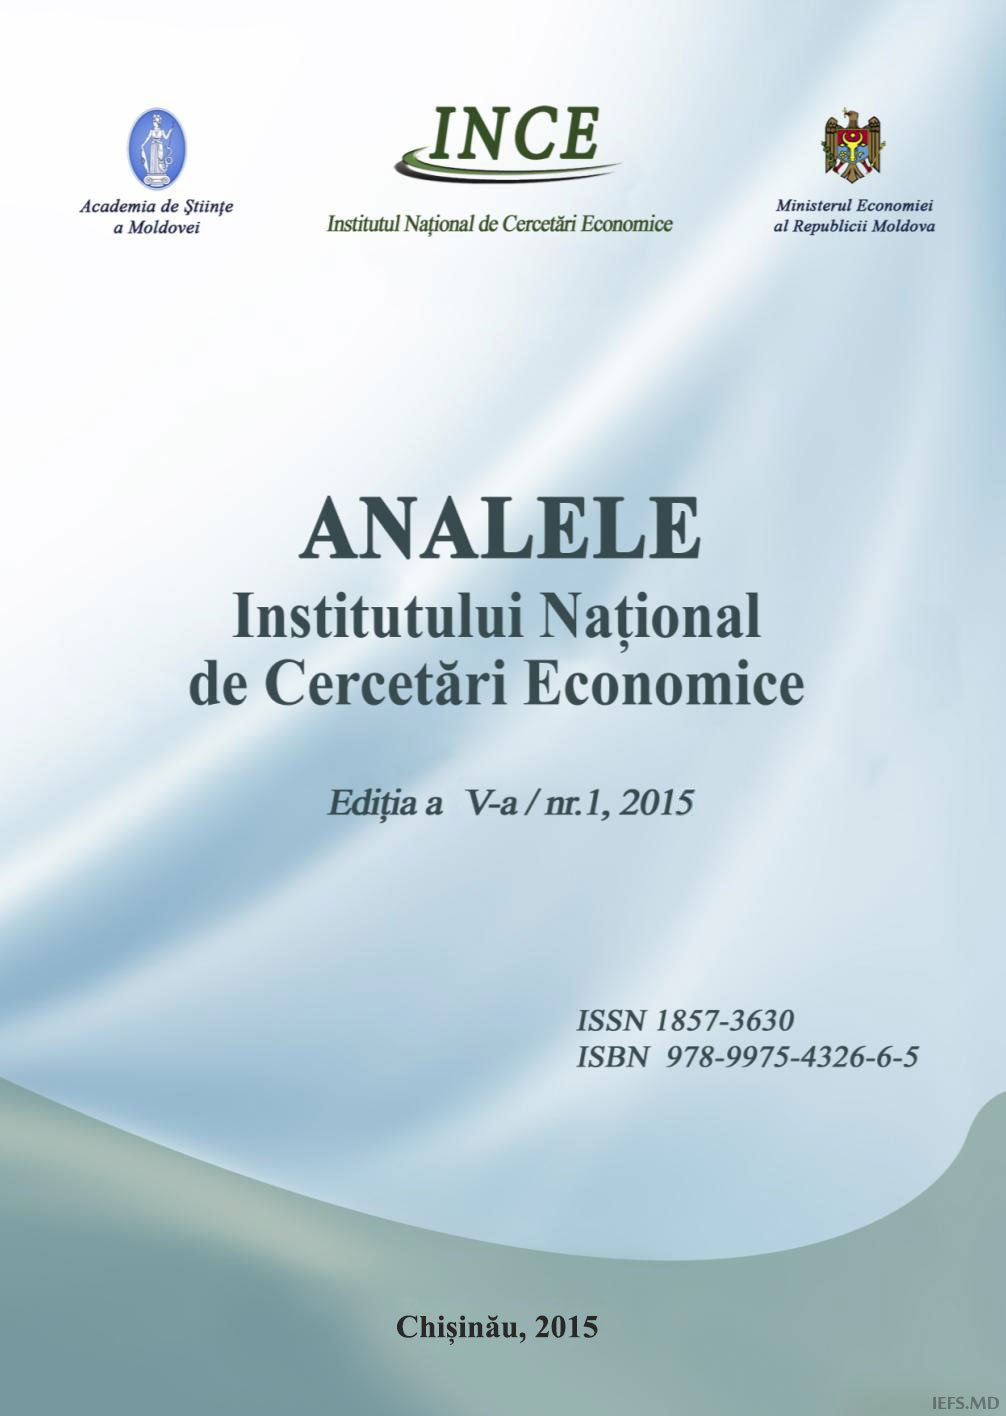 Analele 2015